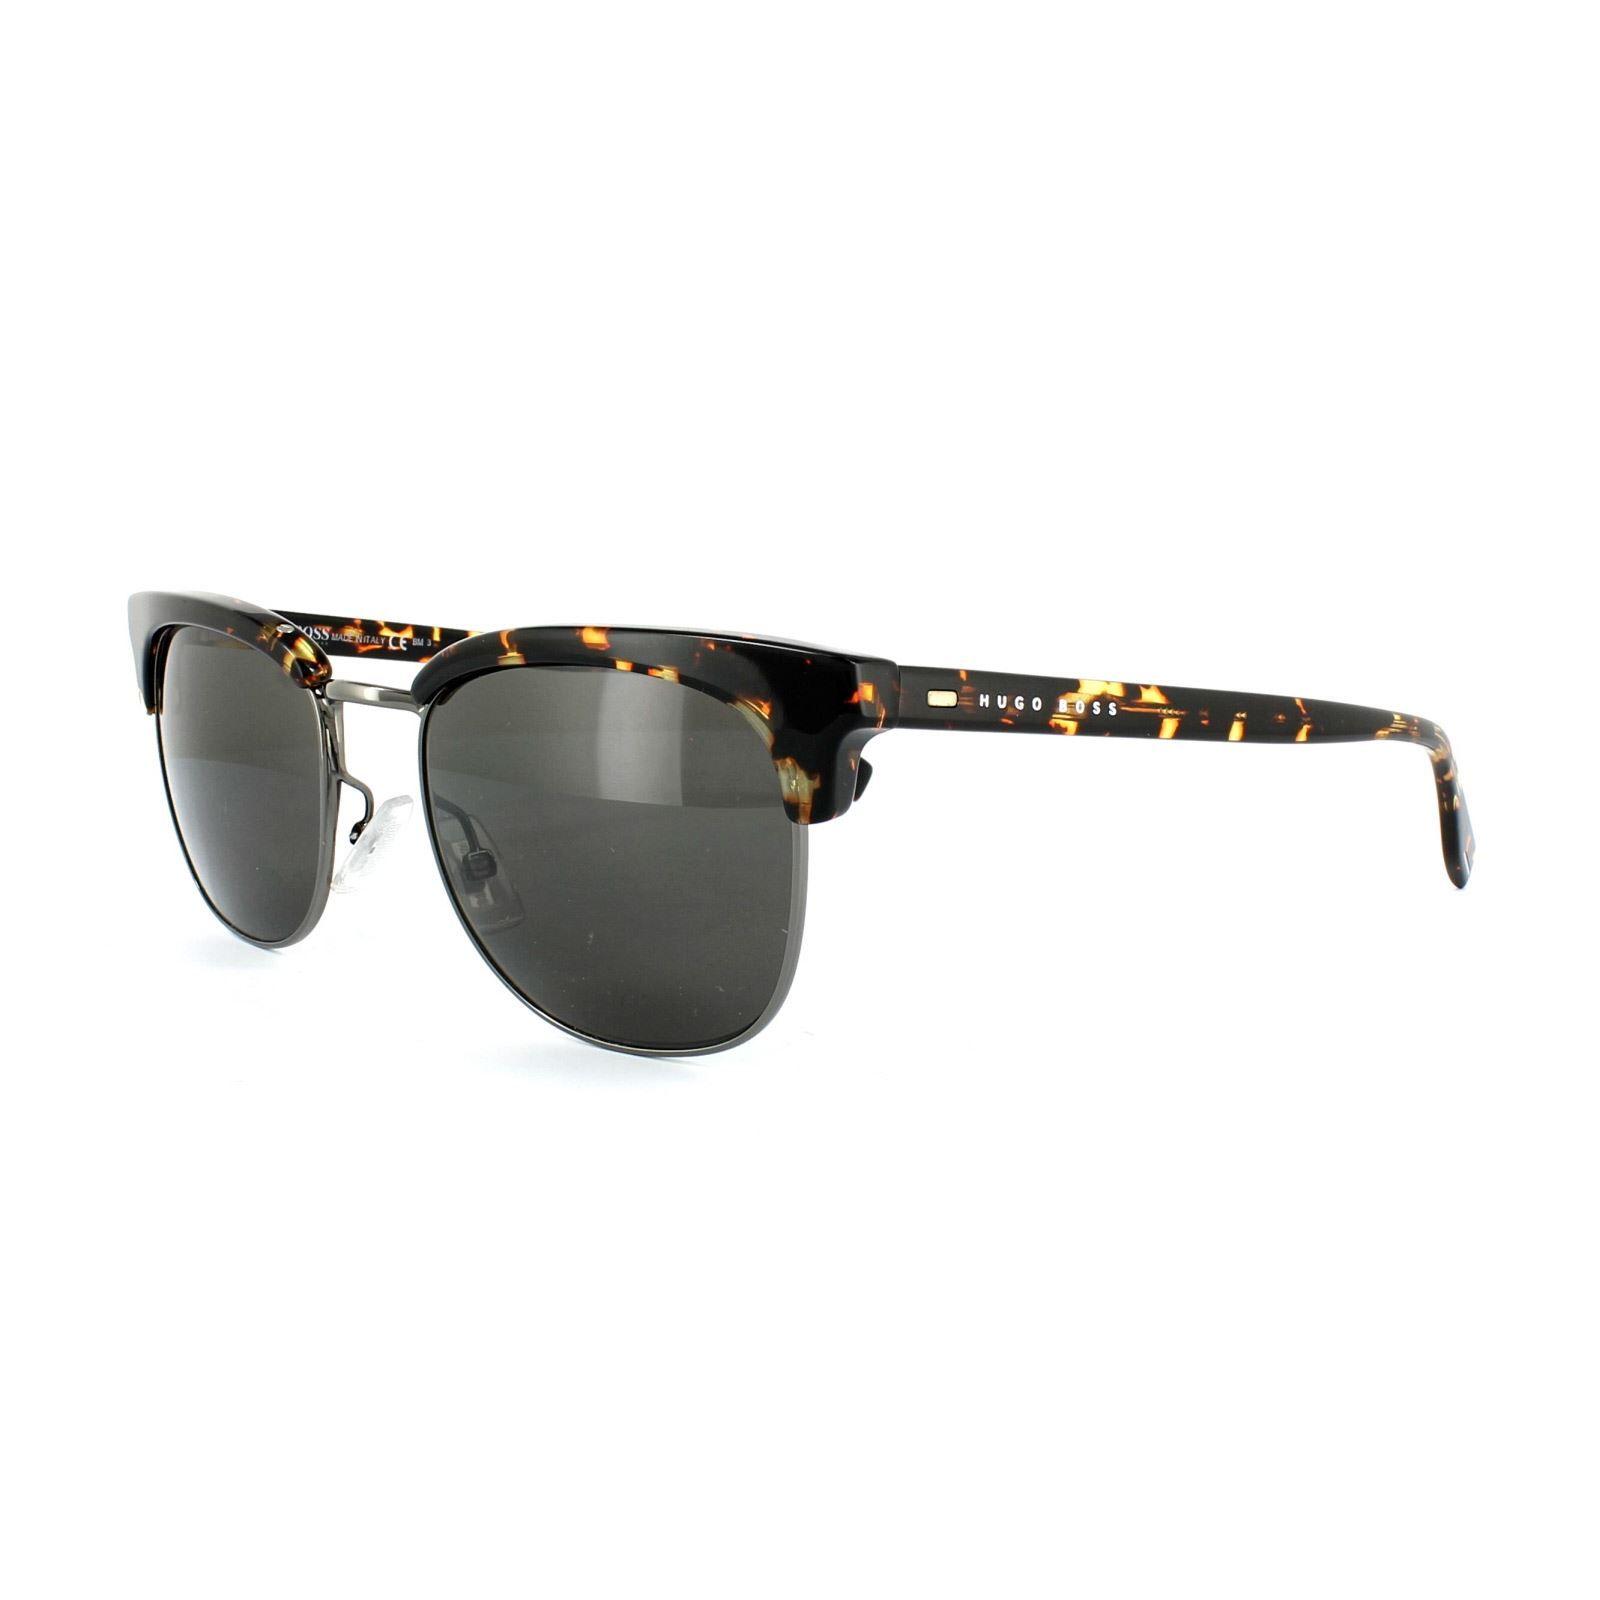 Hugo Boss Sunglasses 0667 TZ4 NR Dark Havana Ruthenium Brown Grey